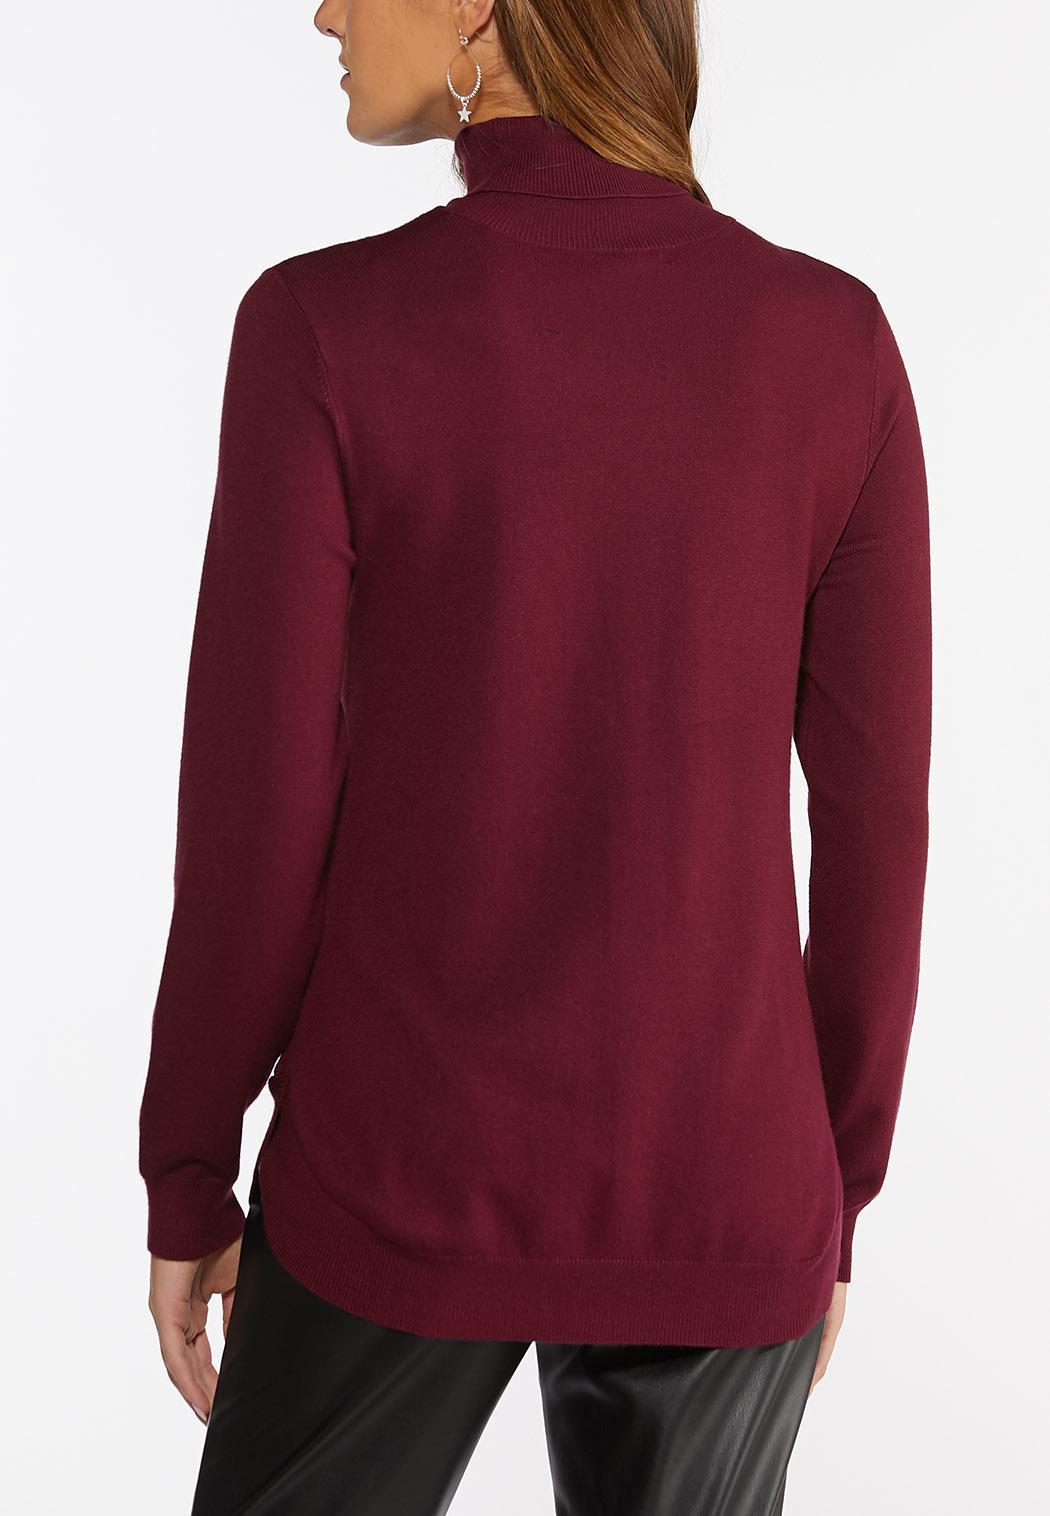 Plus Size Turtleneck Tunic Sweater (Item #44415274)